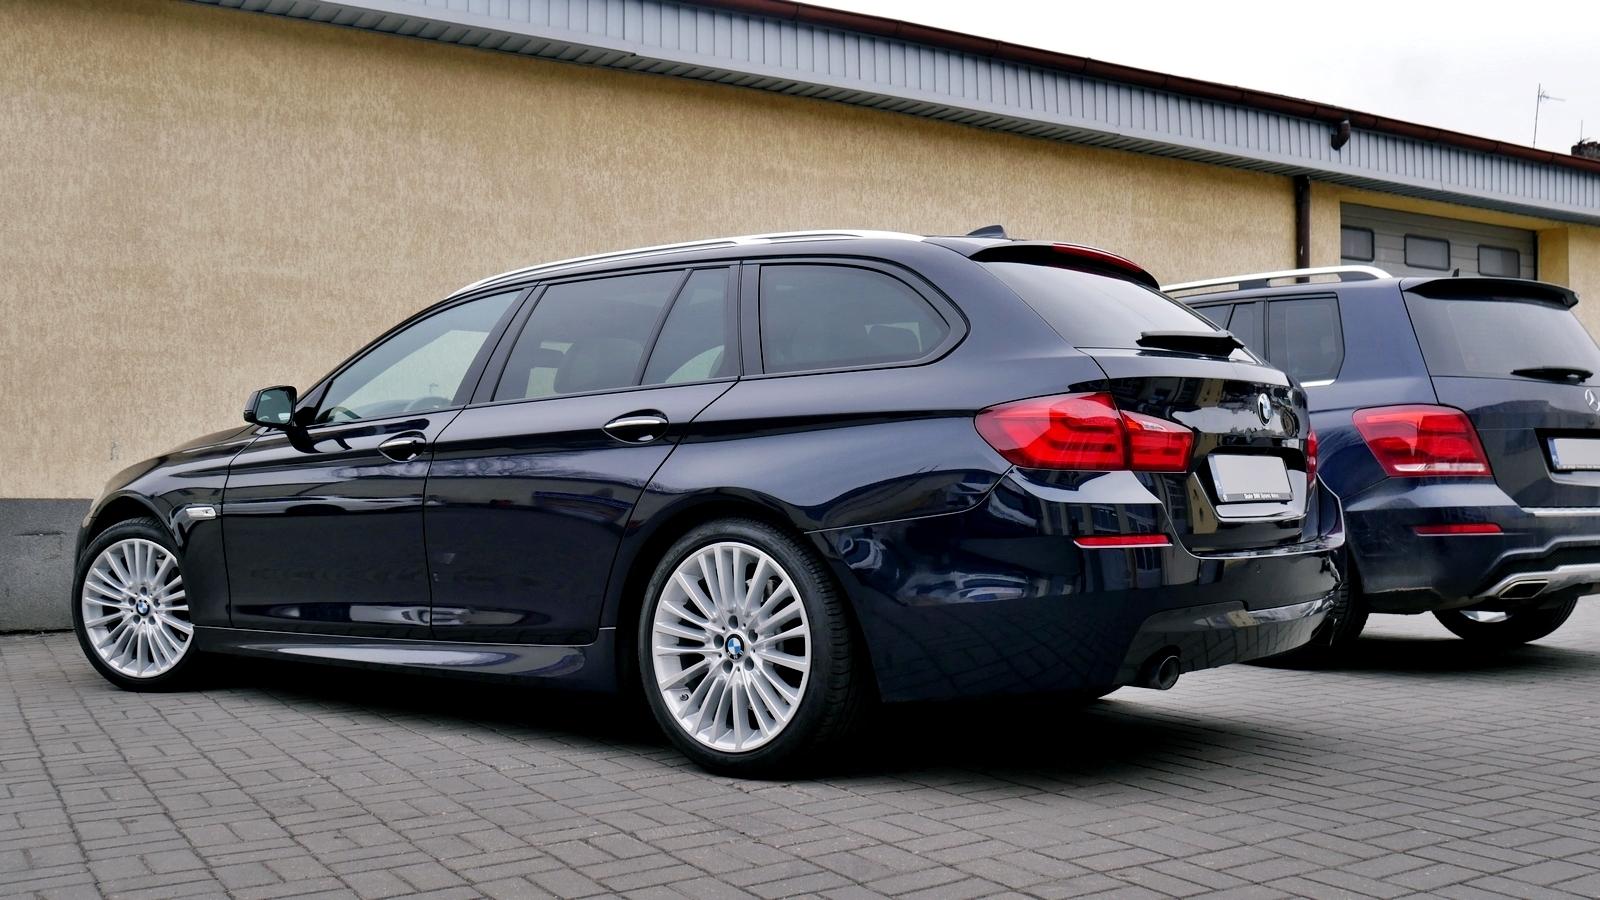 BMW 535d F11 Maxhaust